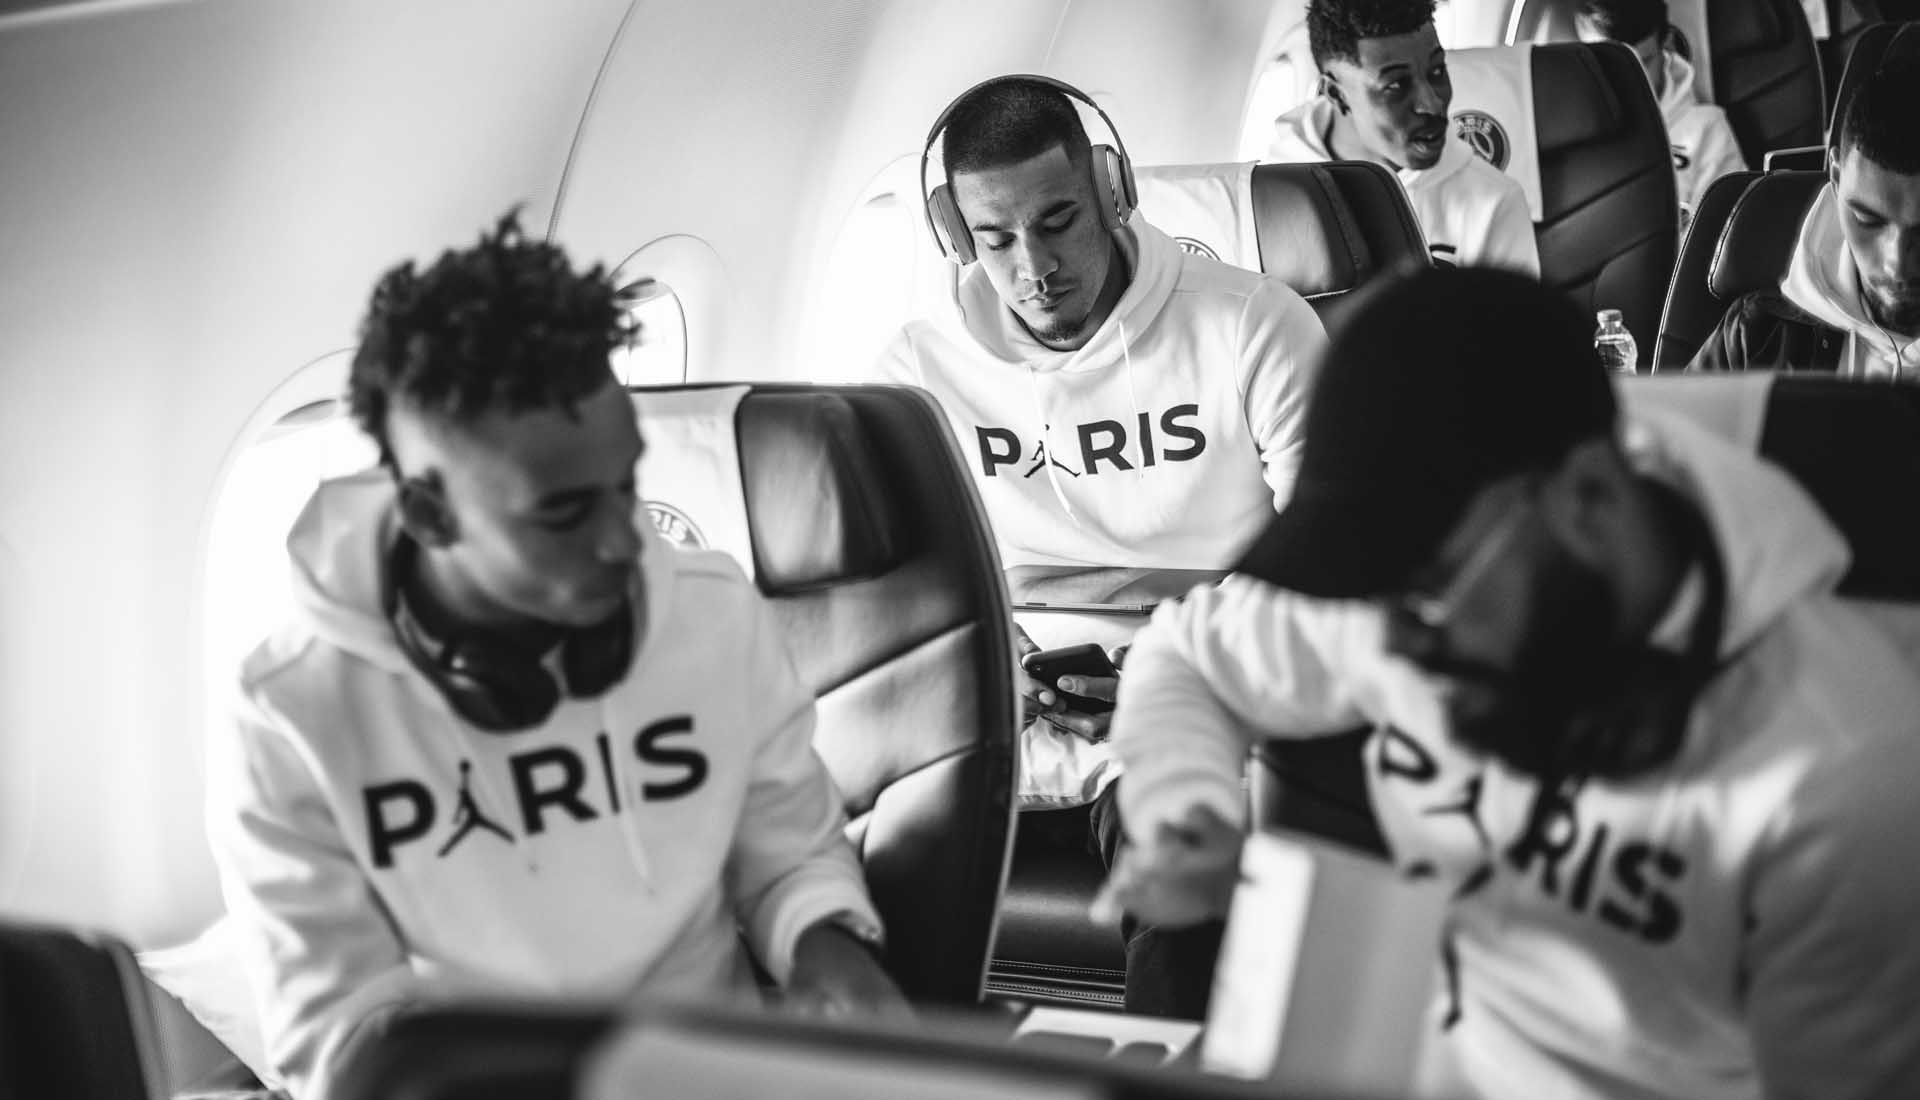 e318340c22c PSG Squad Debut Latest Jordan Collection on Manchester Trip ...